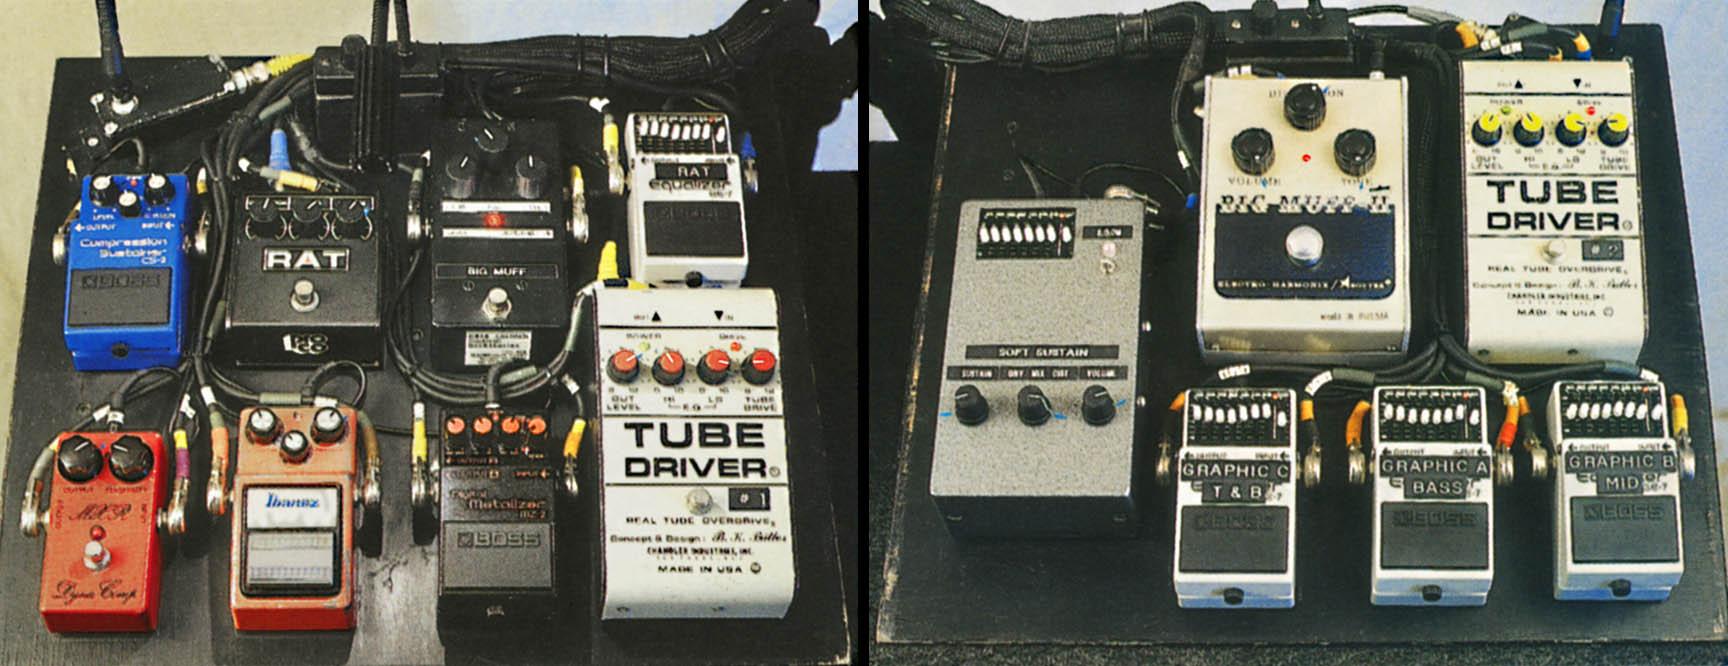 david gilmour 39 s boss mz 2 digital metalizer pedal equipboard. Black Bedroom Furniture Sets. Home Design Ideas